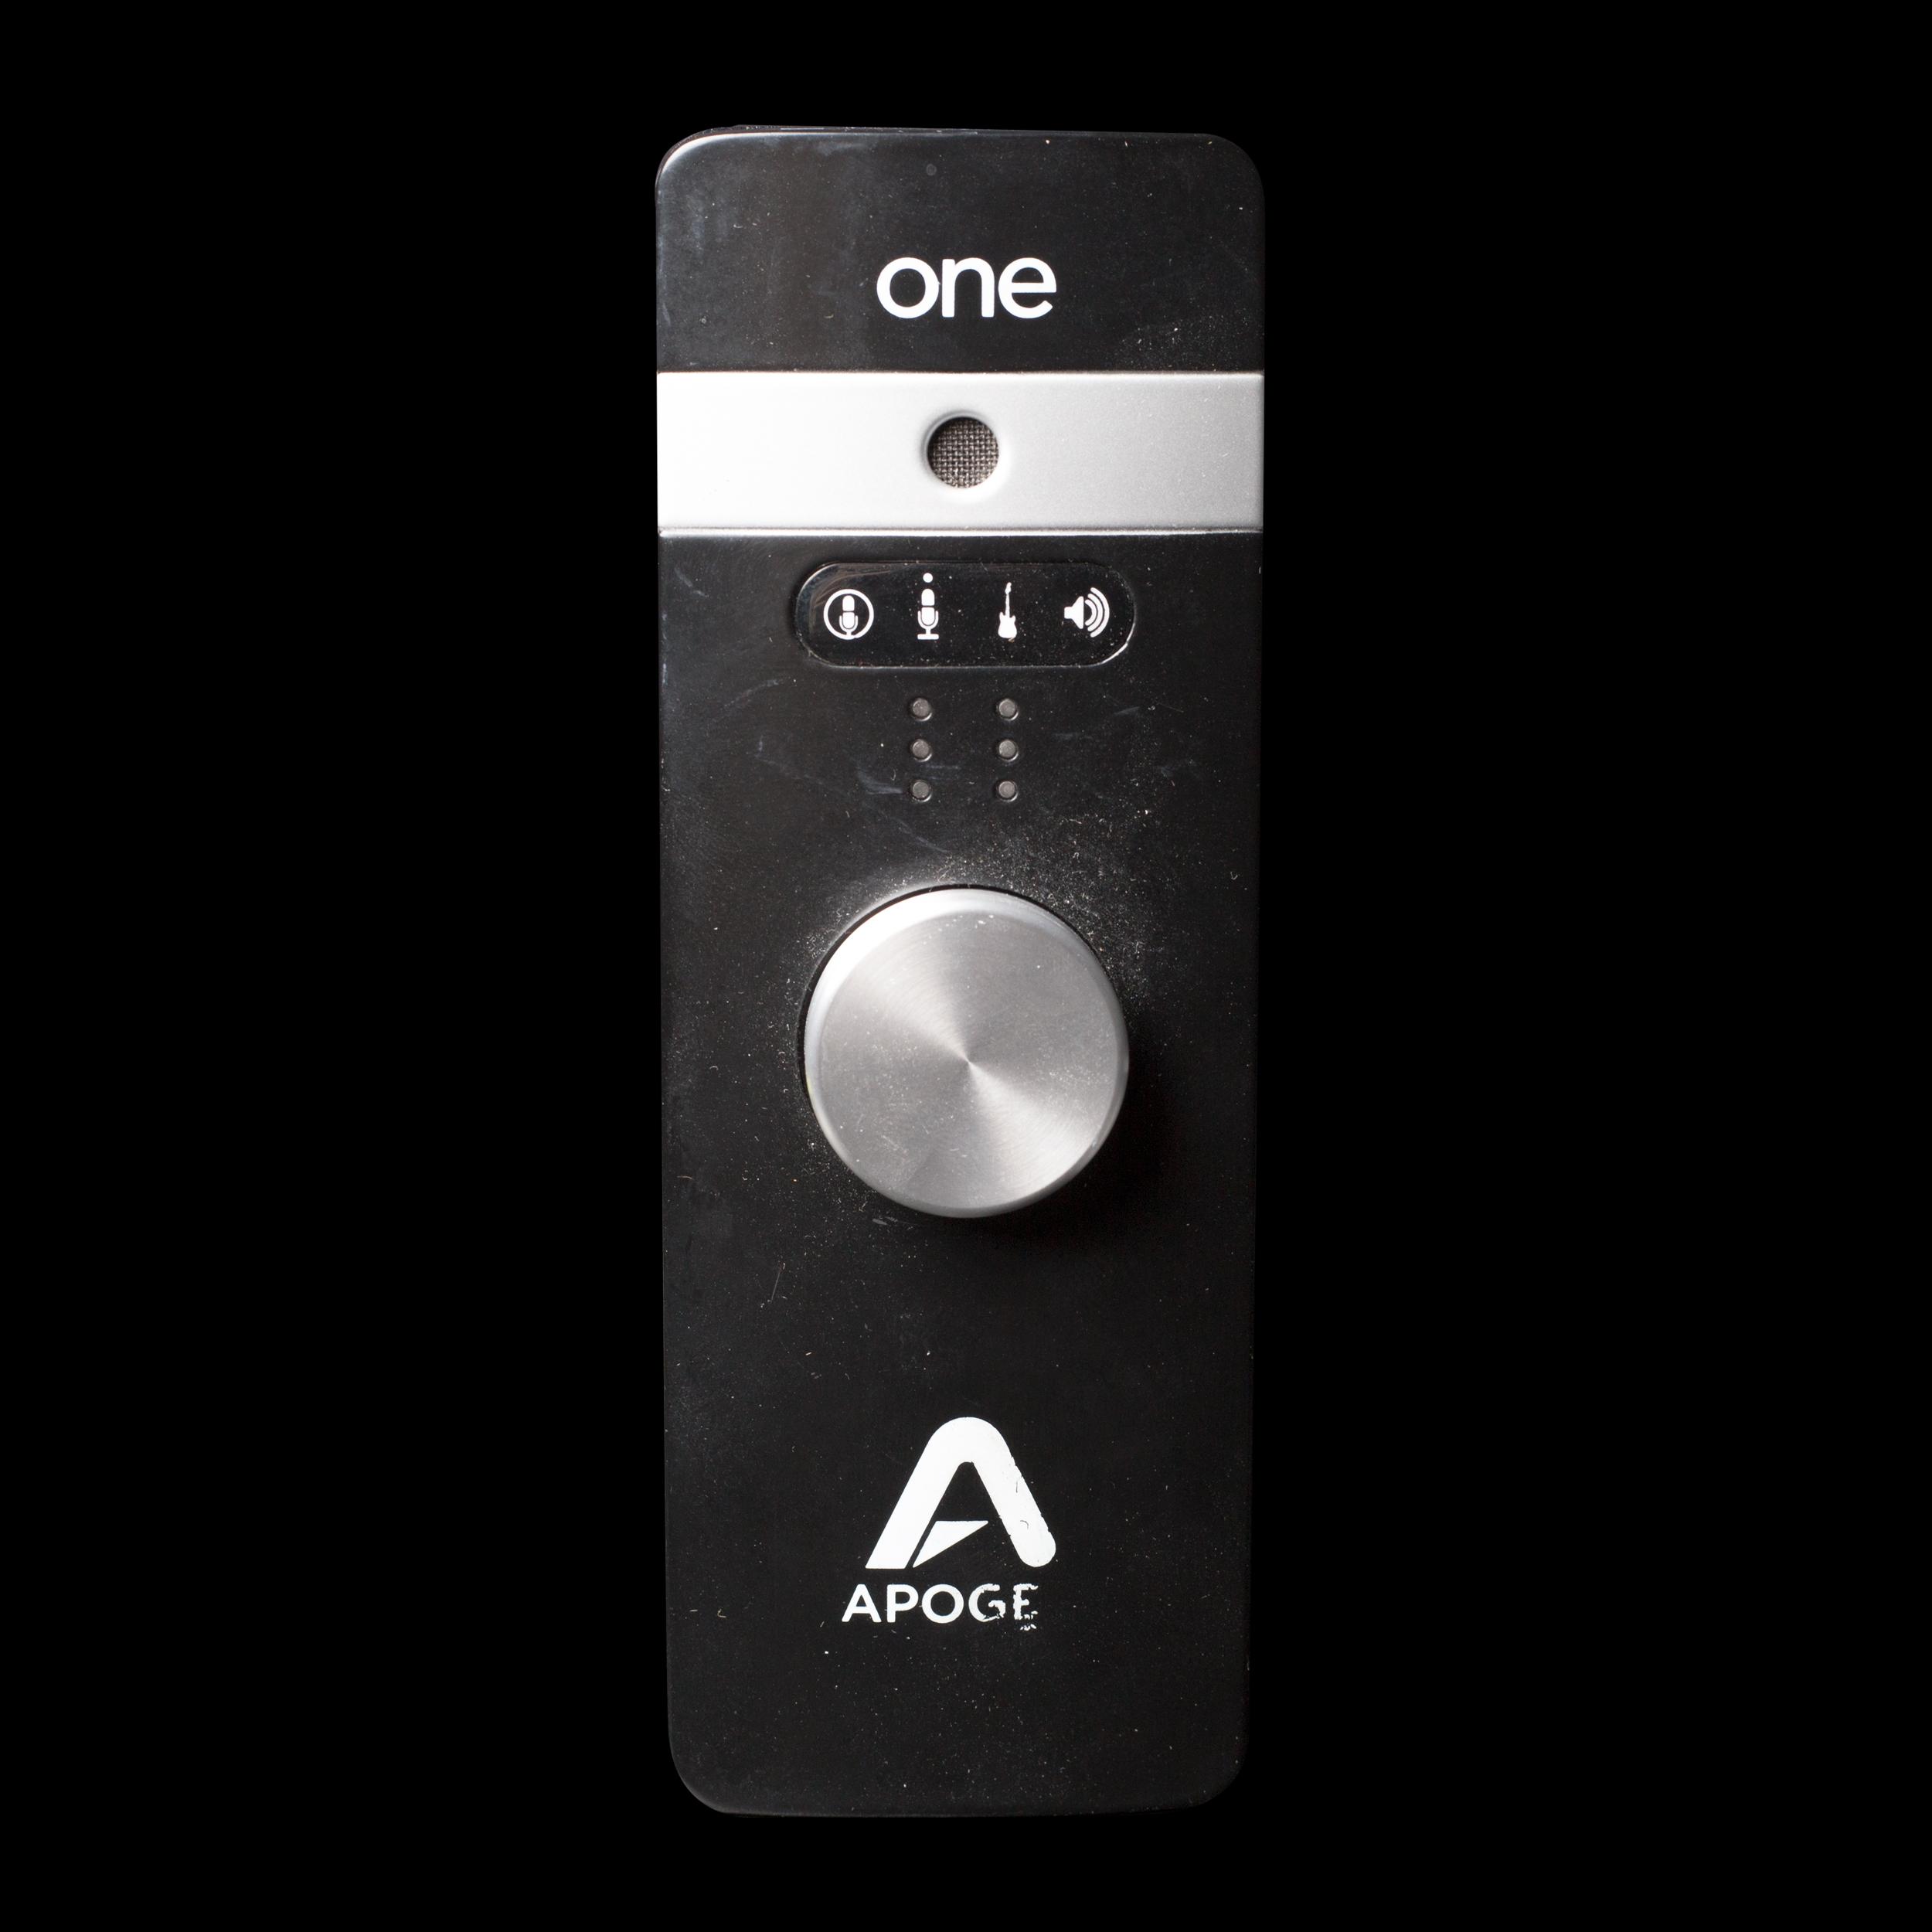 Apogee ONE - apple.com